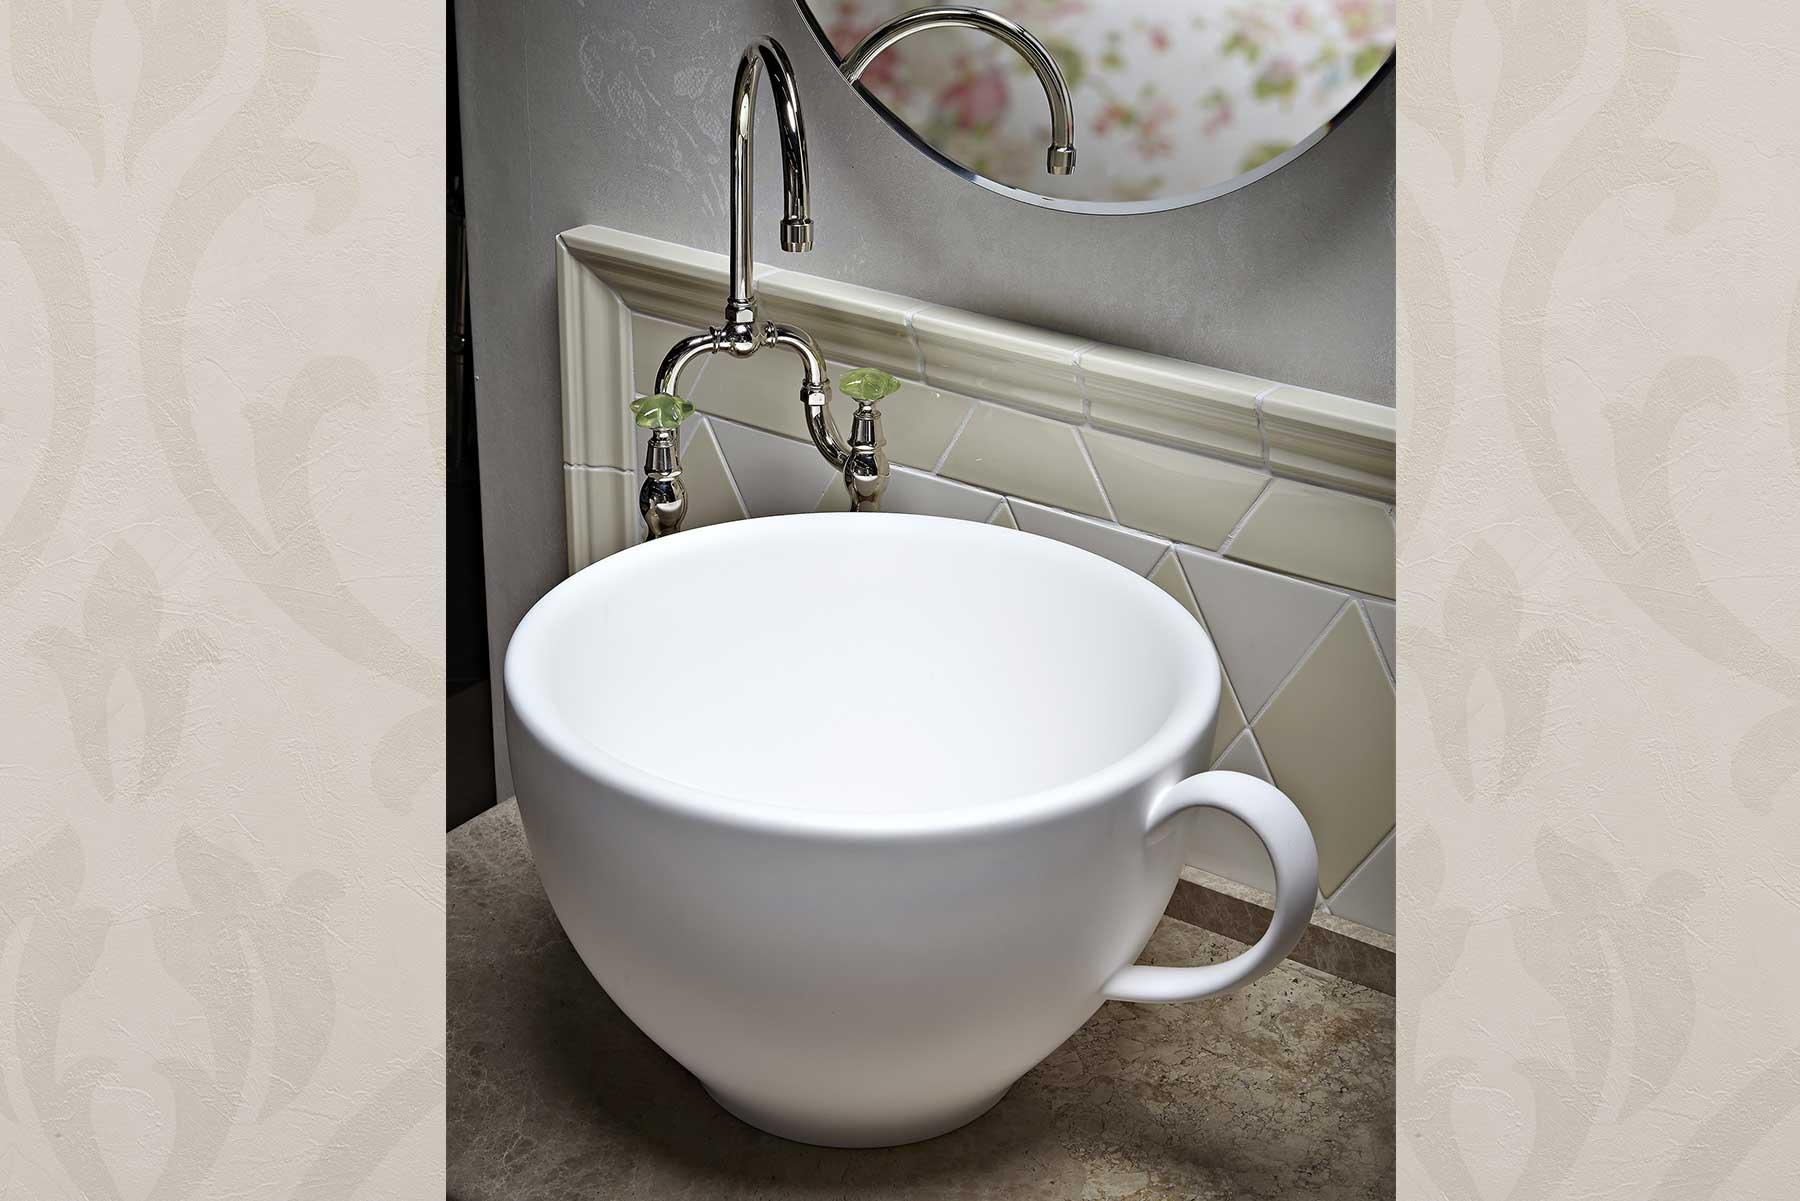 Детская раковина Park Avenue Cappuccino Cup